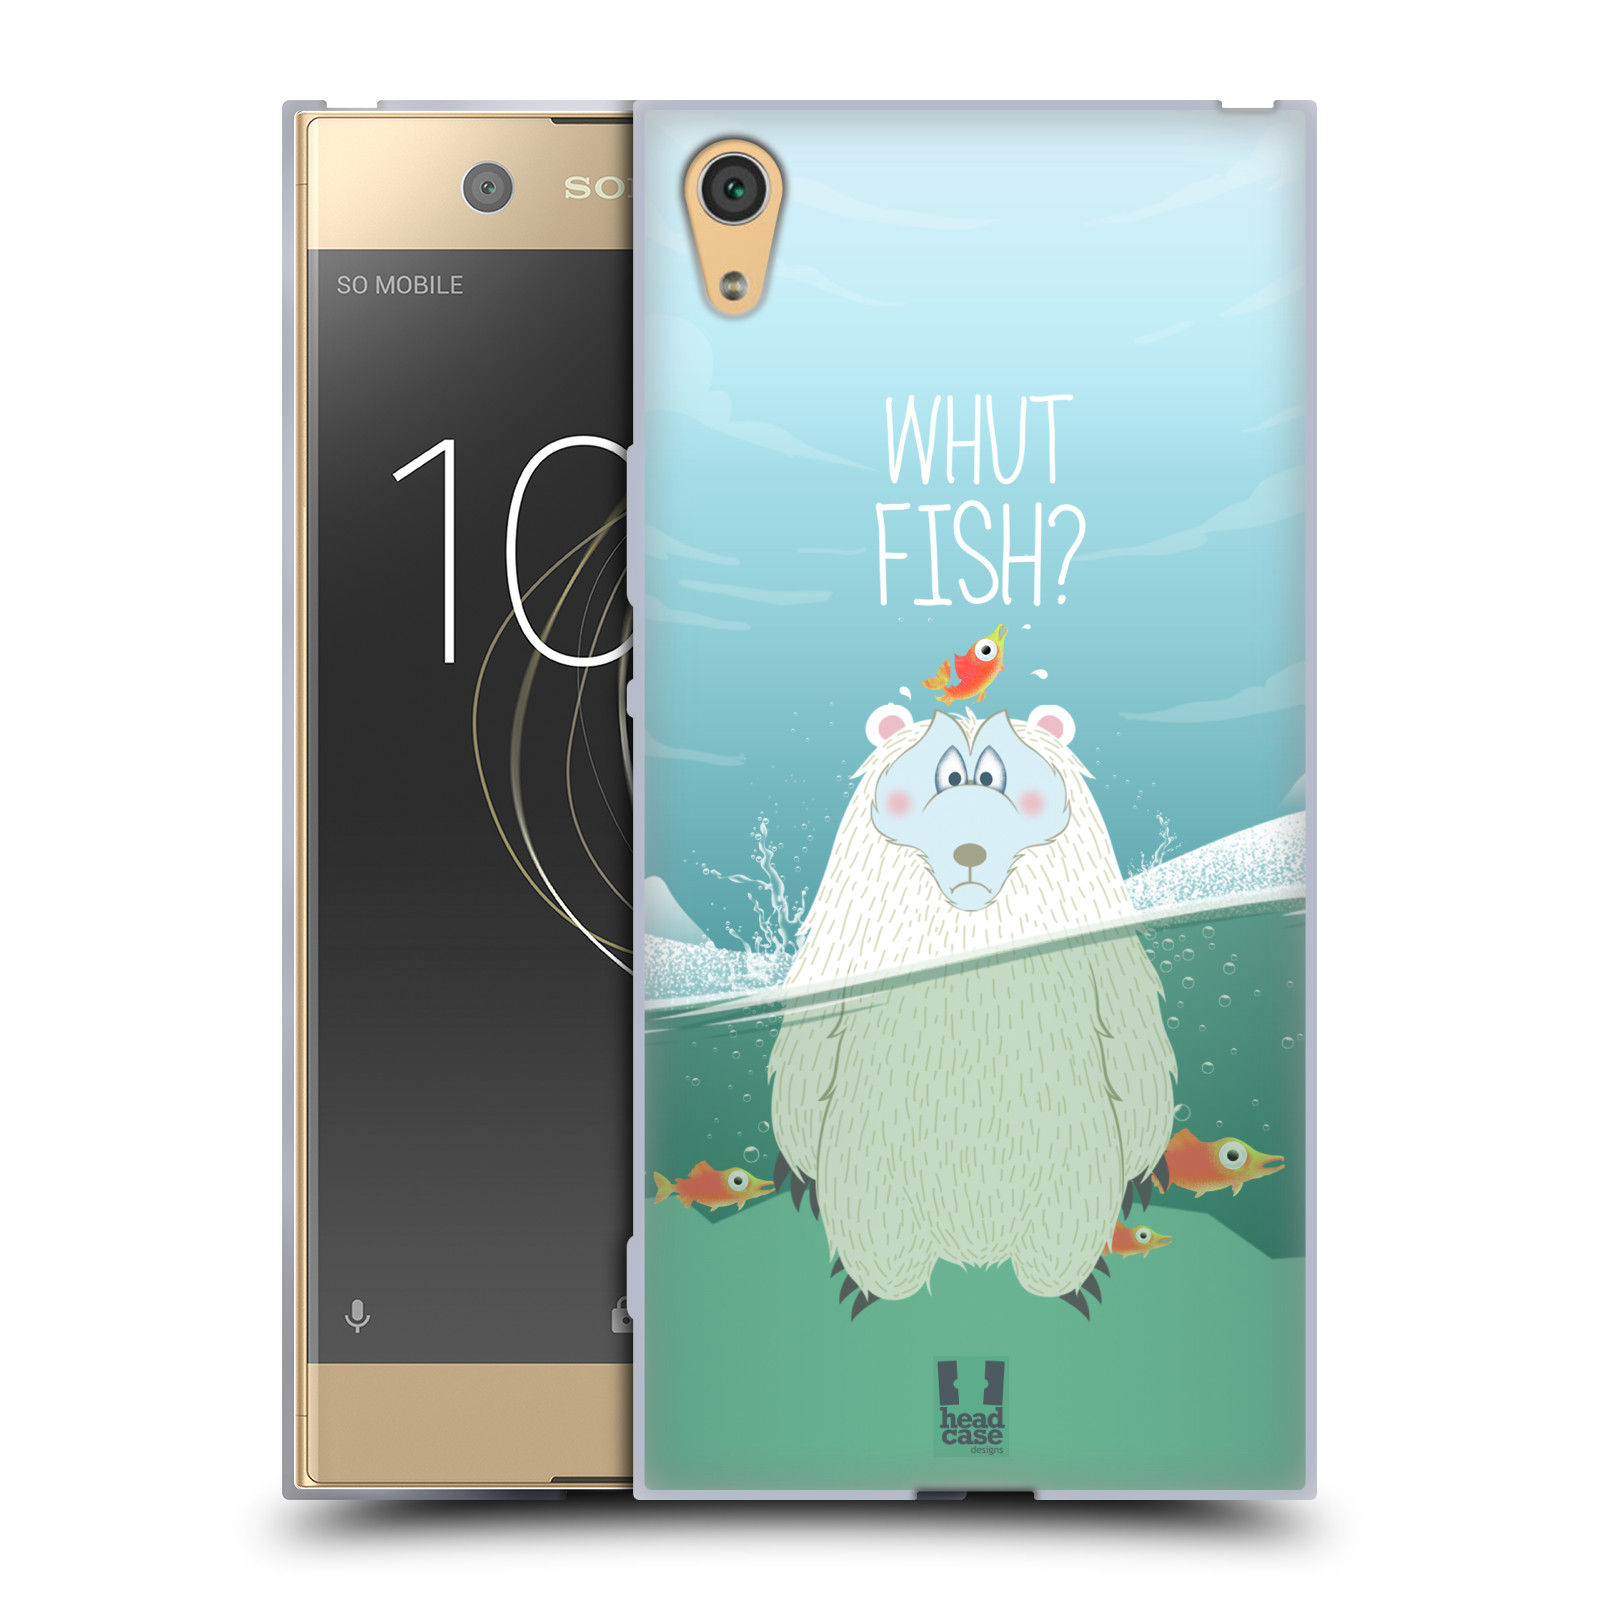 Silikonové pouzdro na mobil Sony Xperia XA1 Ultra - Head Case - Medvěd Whut Fish?